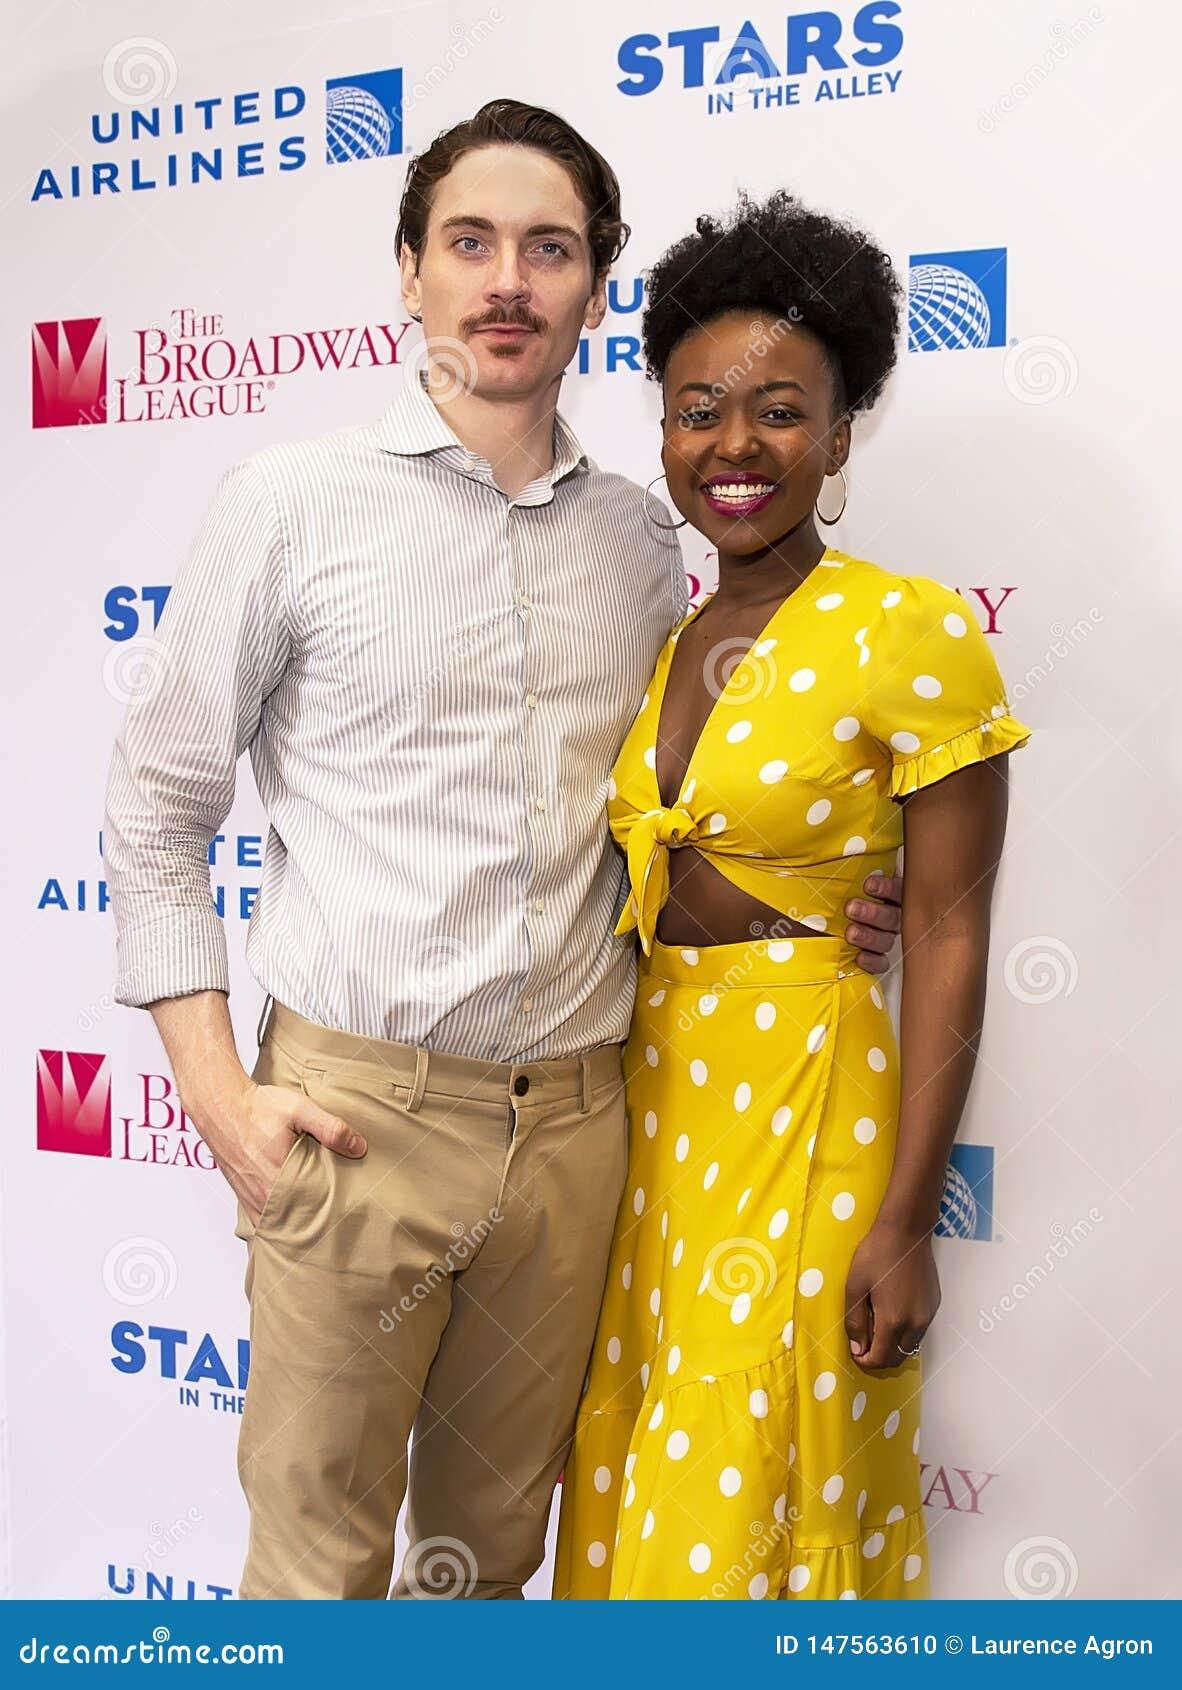 Zach Hess & Aisha Jackson at 2019 Stars in the Alley